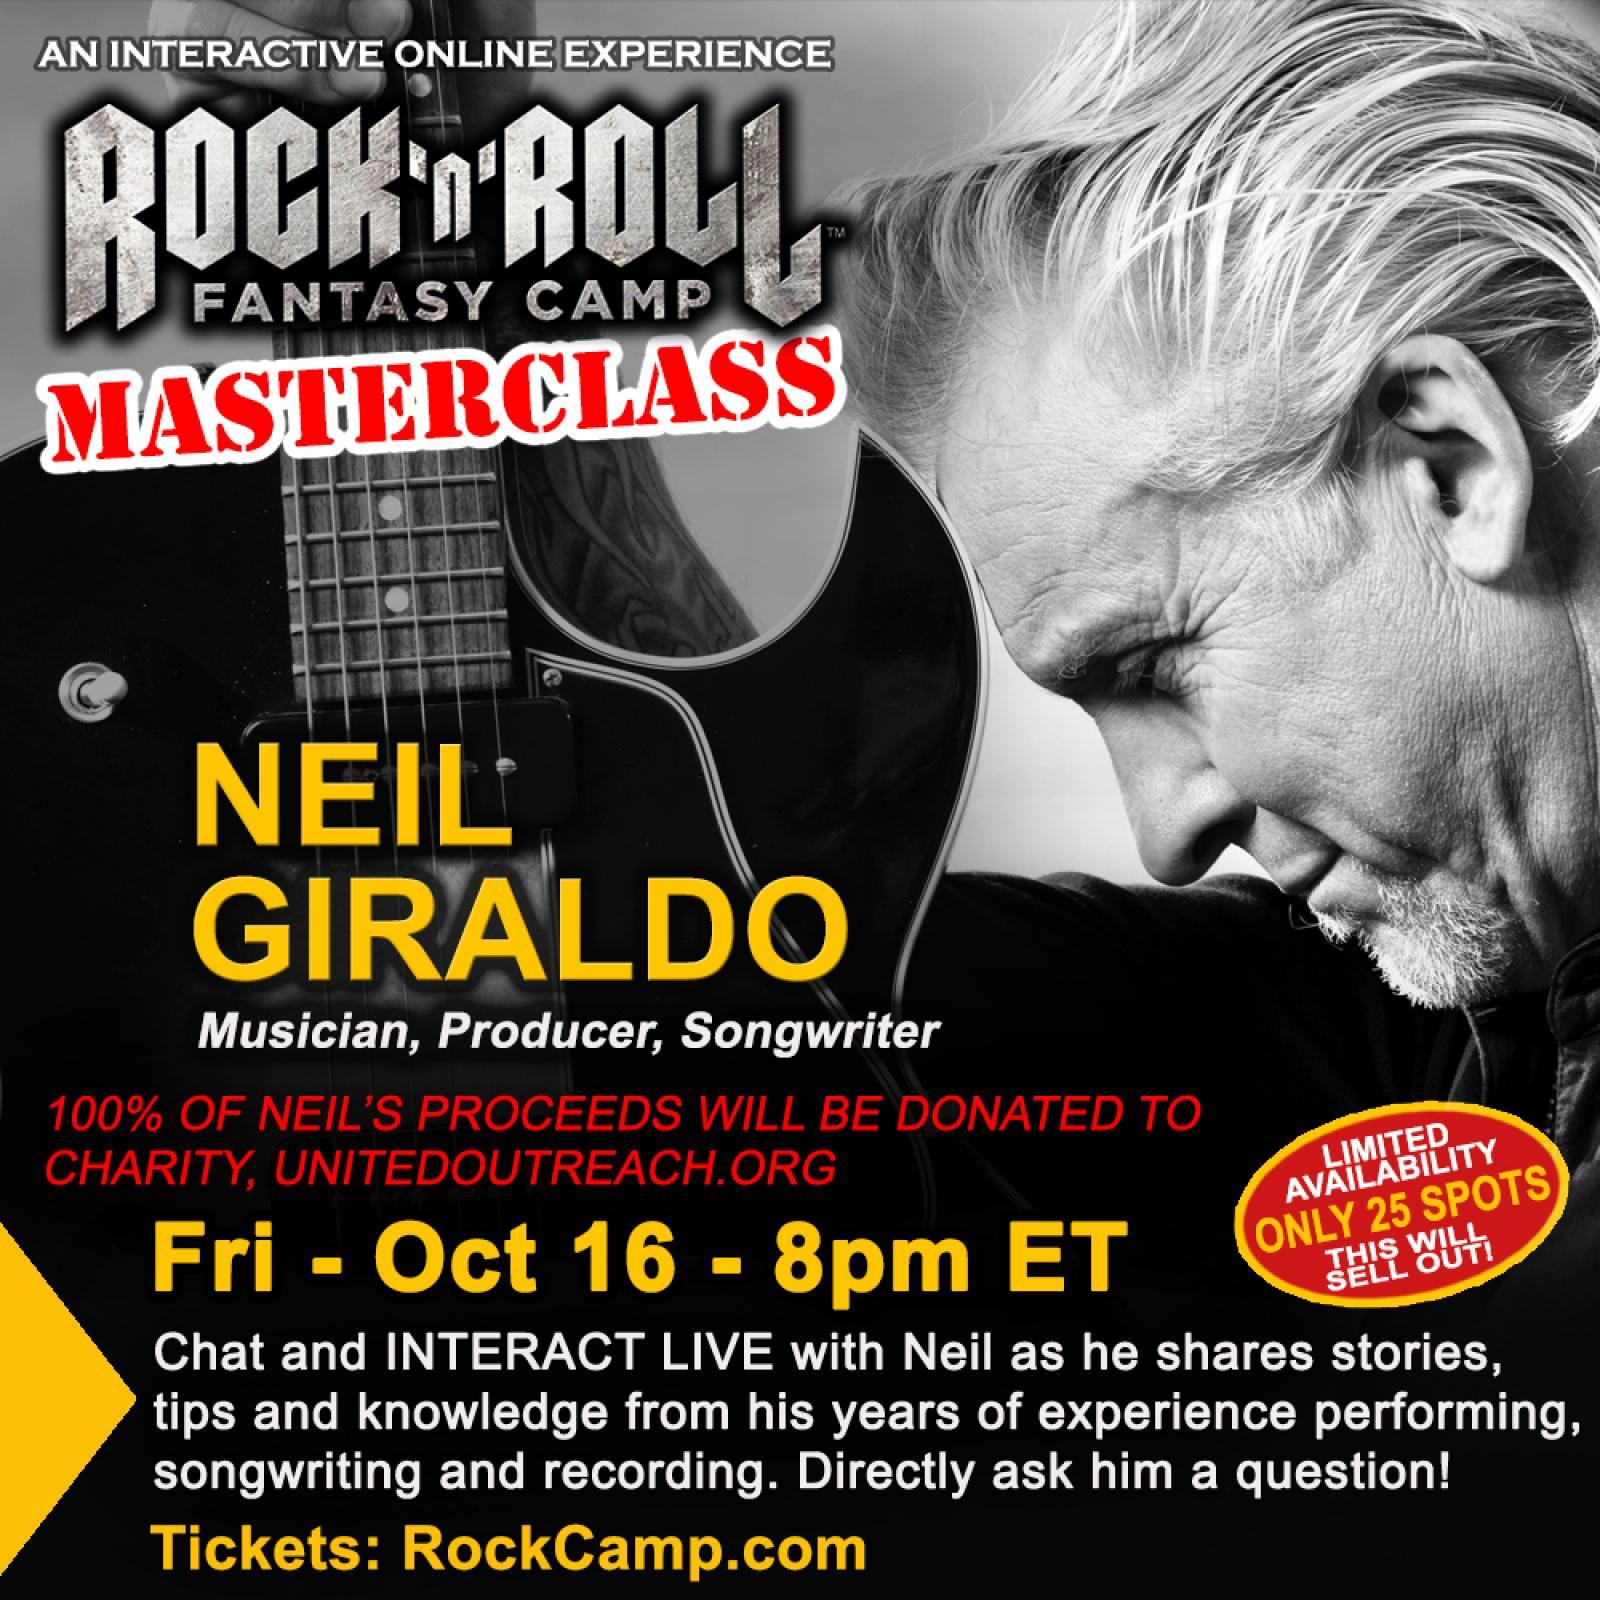 Masterclass with Neil Giraldo